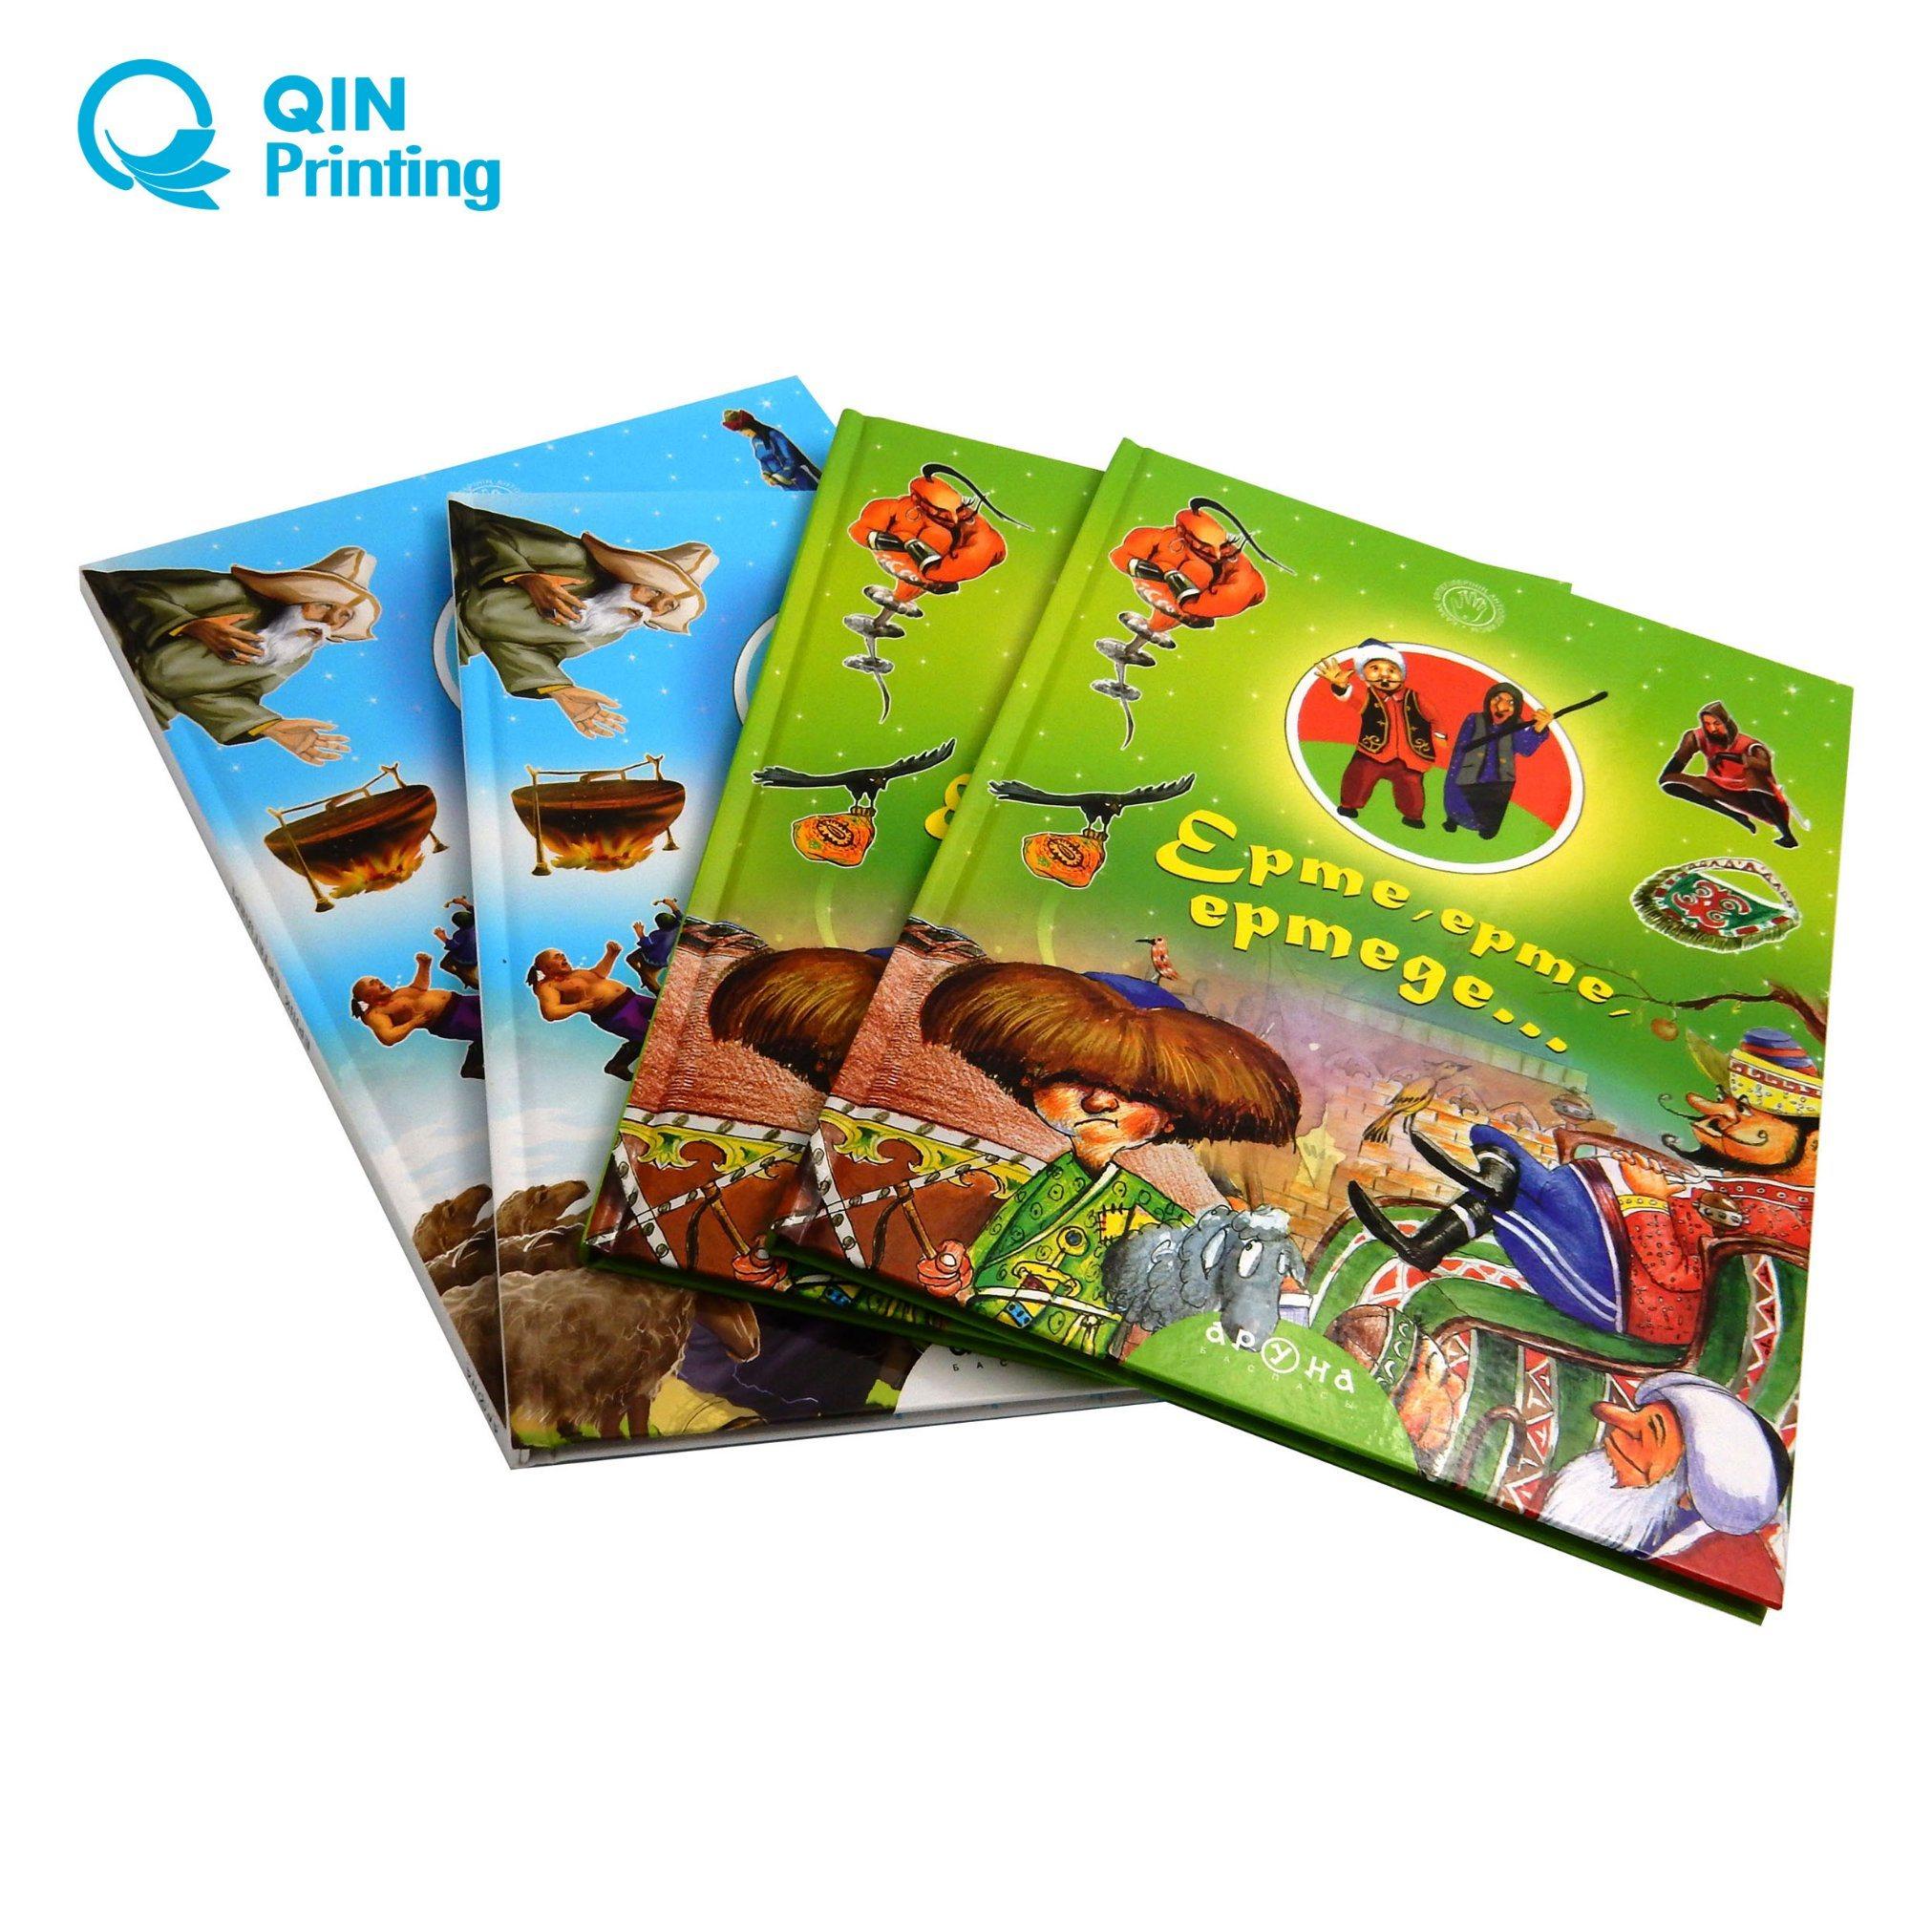 Best Eco Printer 2020 China Eco Friendly Top Quality Children Book Printing   China